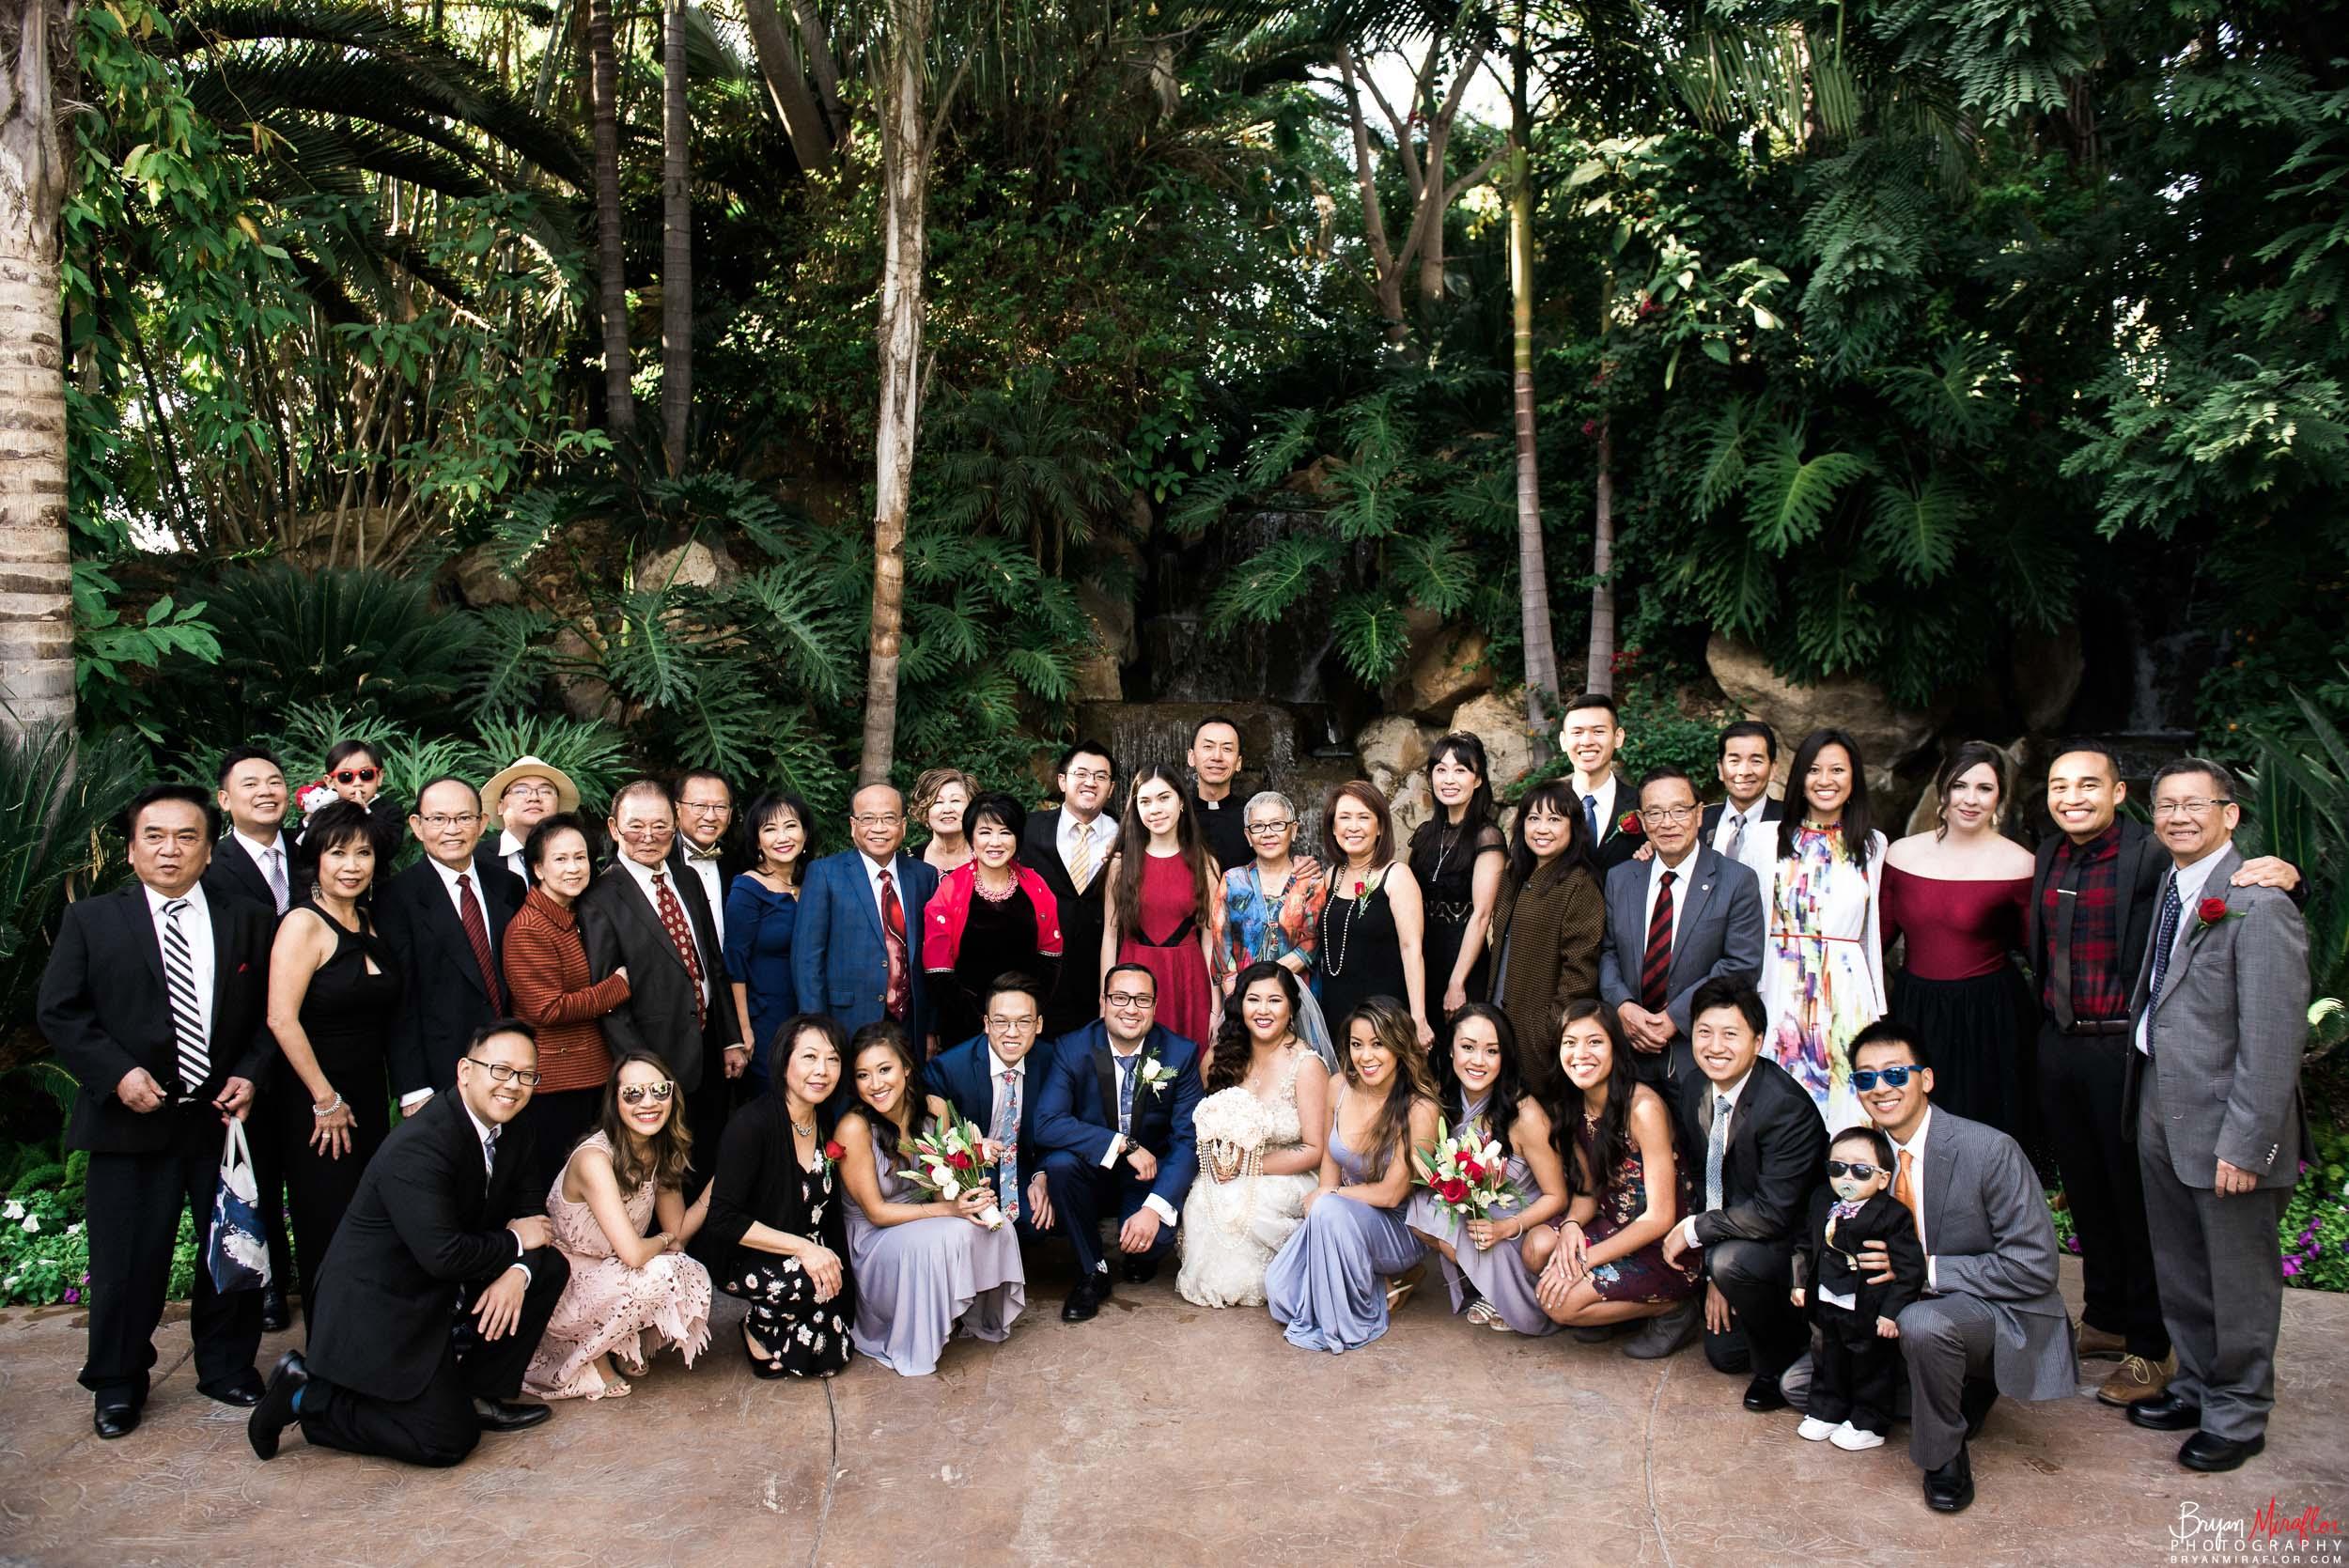 Bryan-Miraflor-Photography-Hannah-Jonathan-Married-Grand-Traditions-Estate-Gardens-Fallbrook-20171222-142.jpg